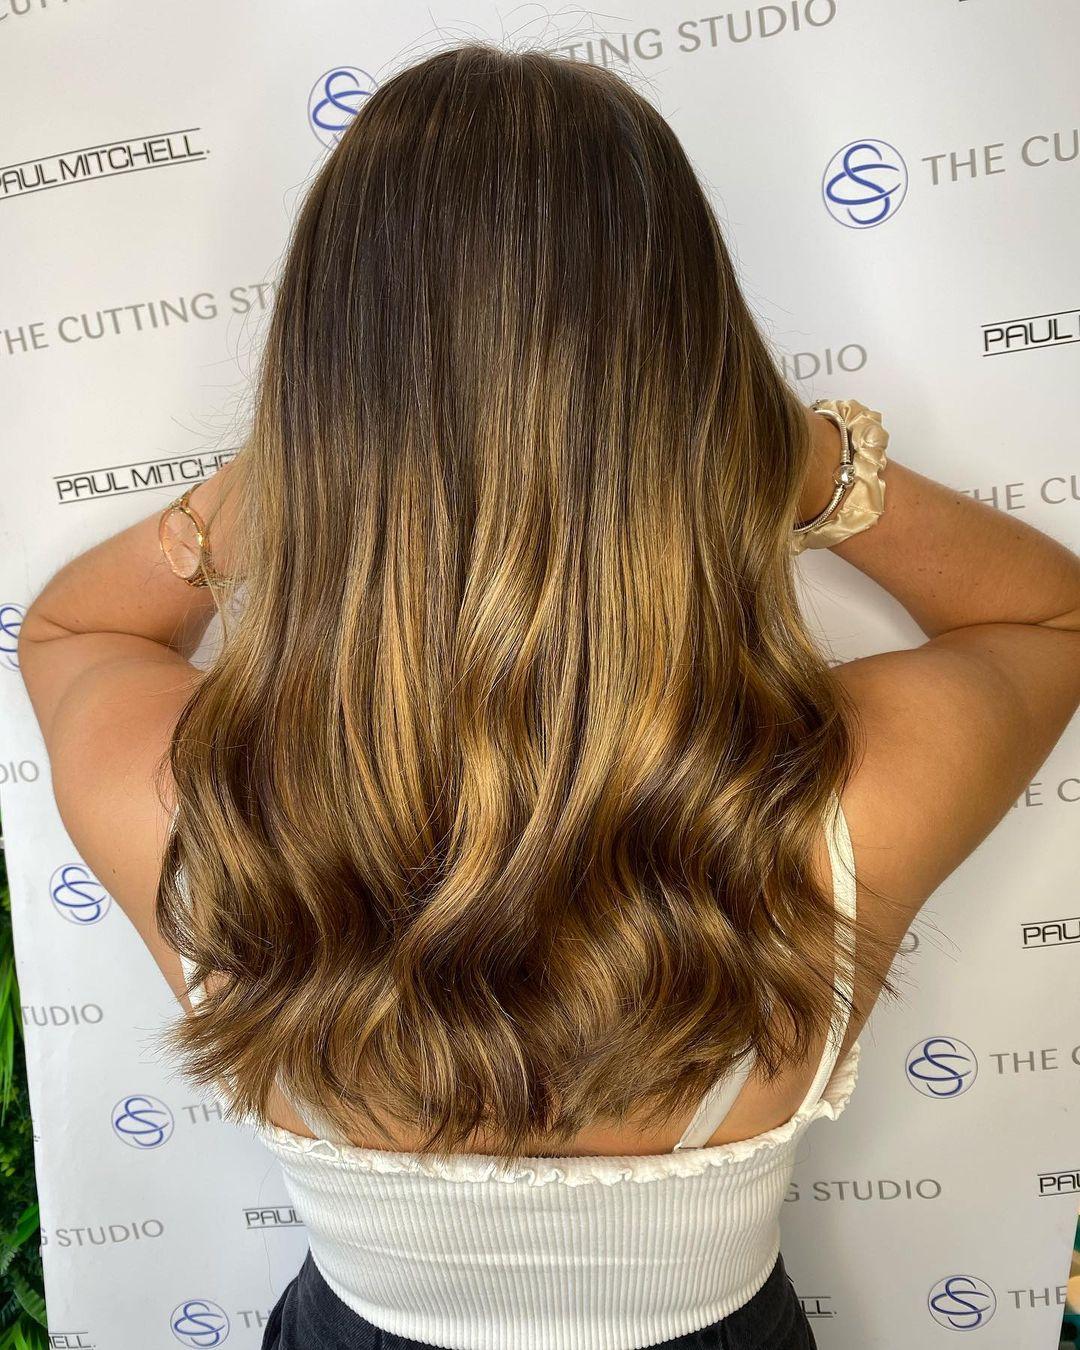 beautiful balayage hair colours at the Cutting Studion hair salon, Buckinghamshire